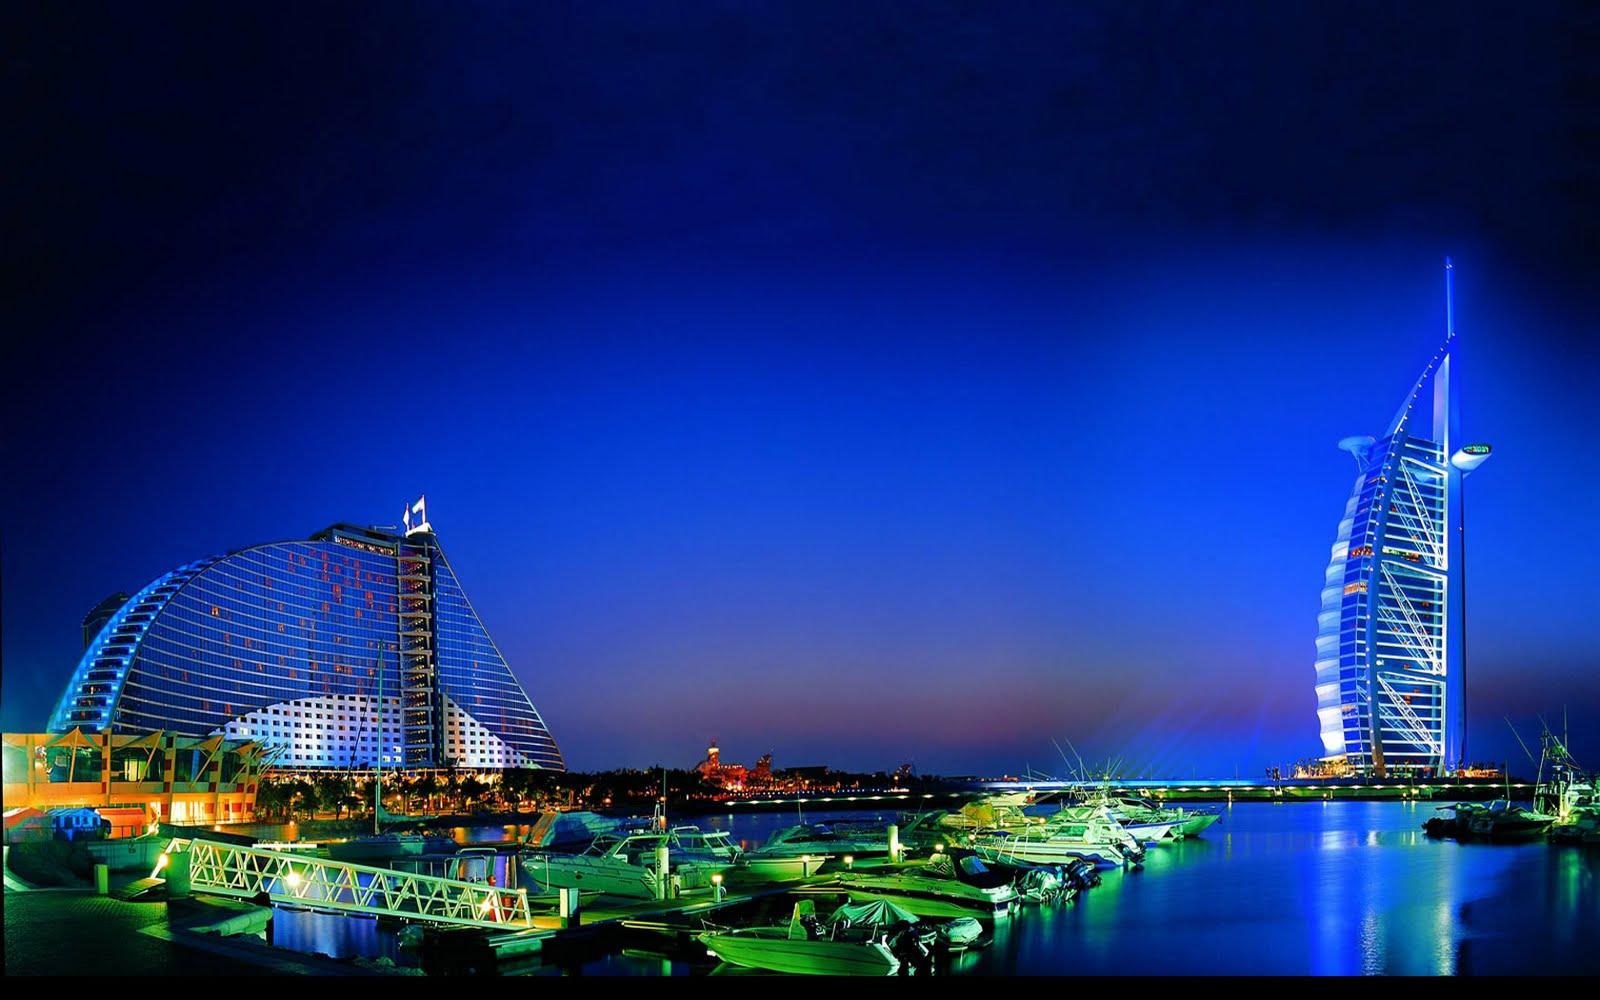 Cruise Deals: Last Minute Cruise Deals & Vacation Specials